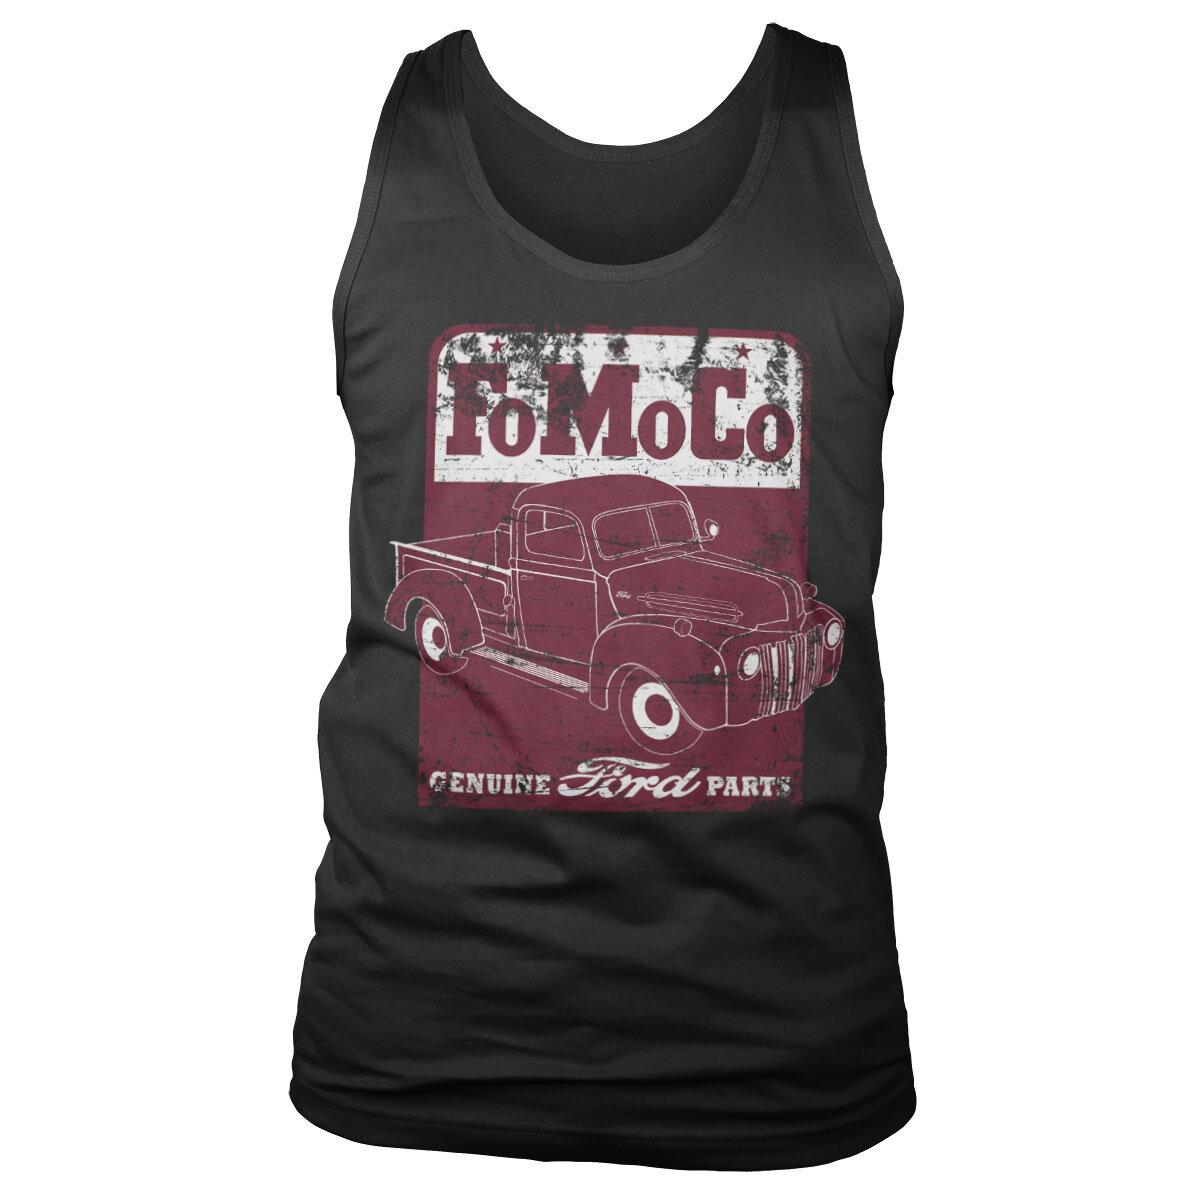 FoMoCo - Genuine Ford Parts Tank Top